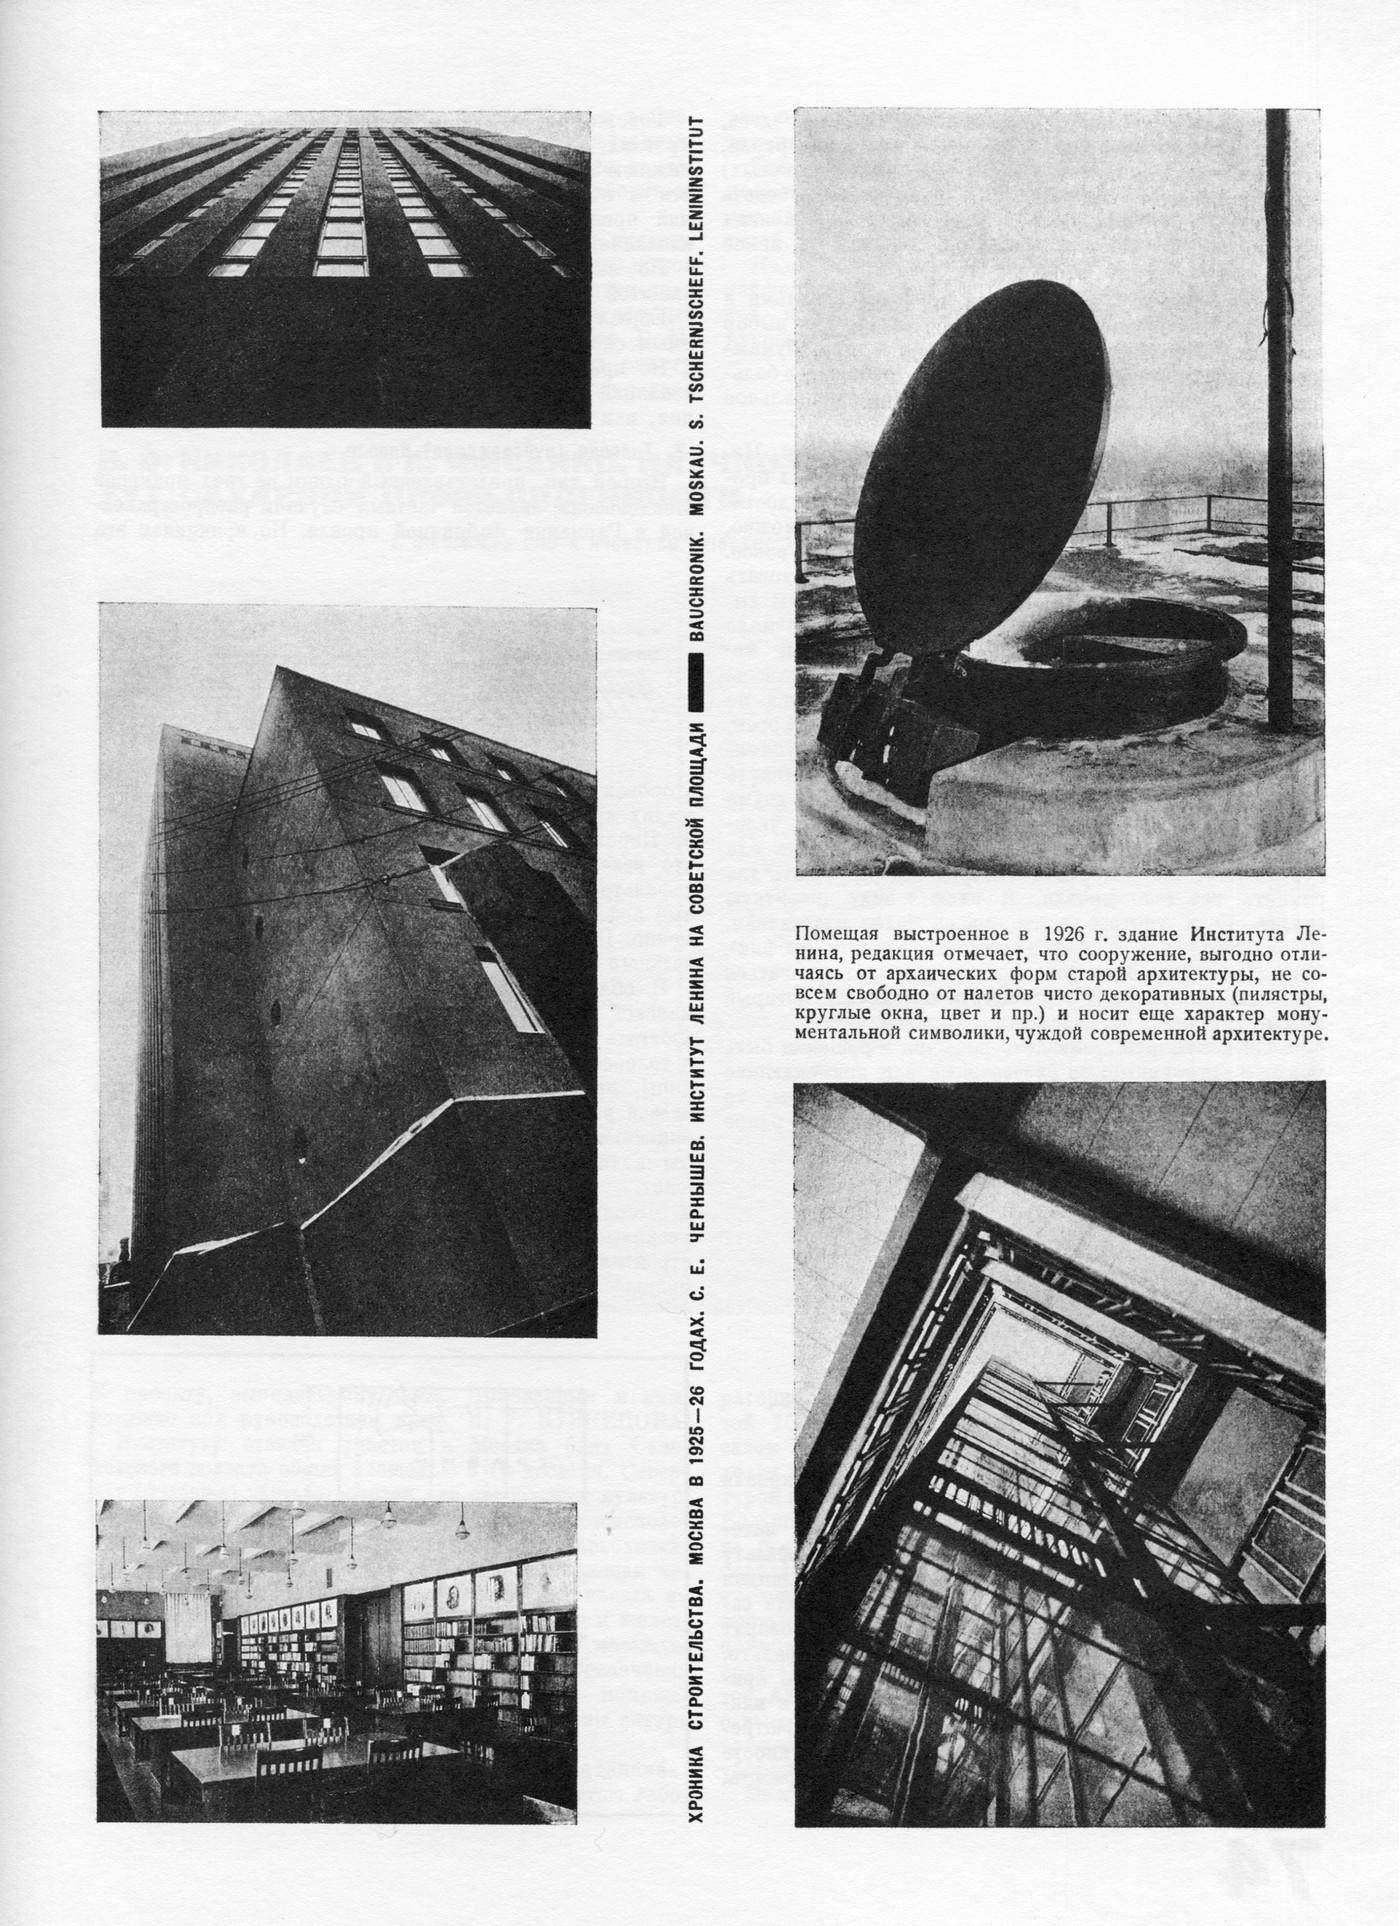 tehne.com-sa-1927-2-1400-029